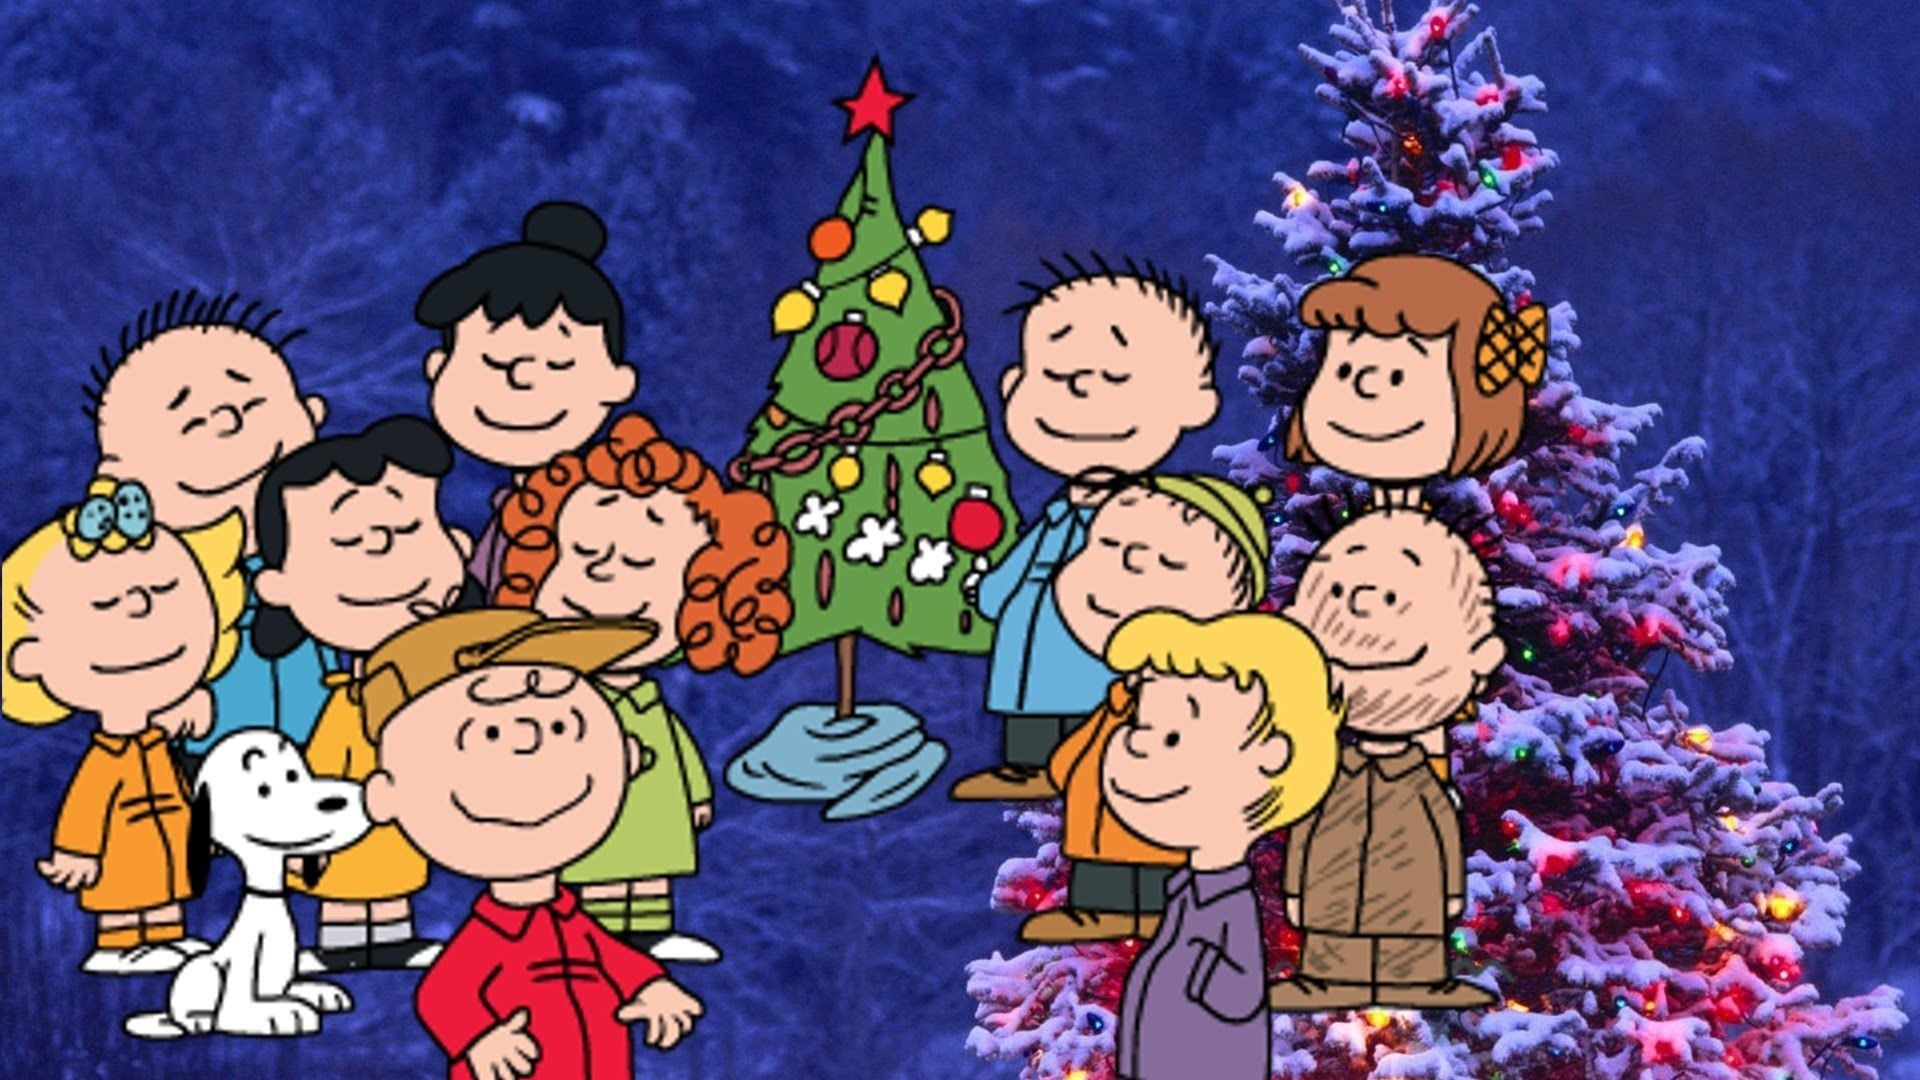 Peanuts Christmas Wallpaper for